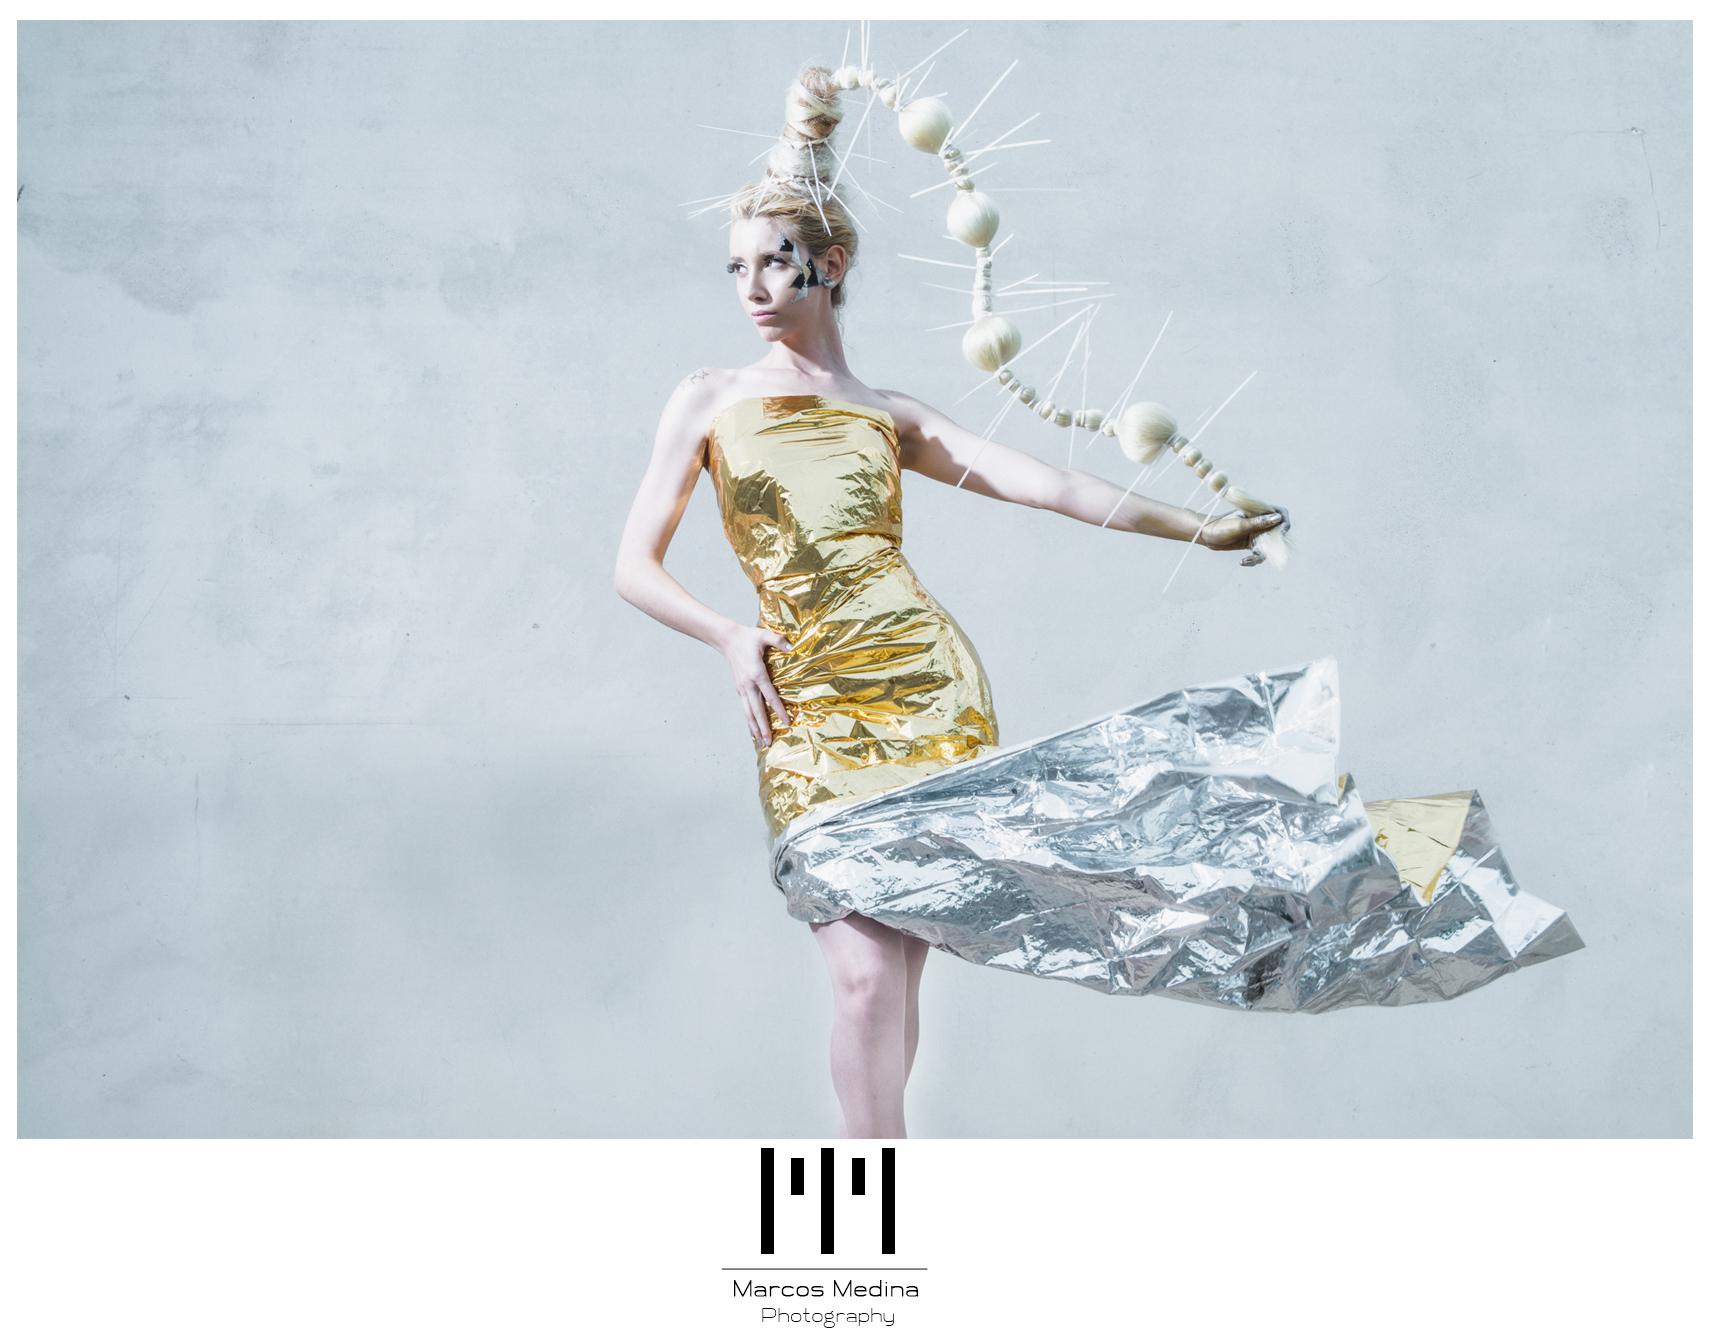 Marcos_Medina_Photography_Fashion_Futurista_6